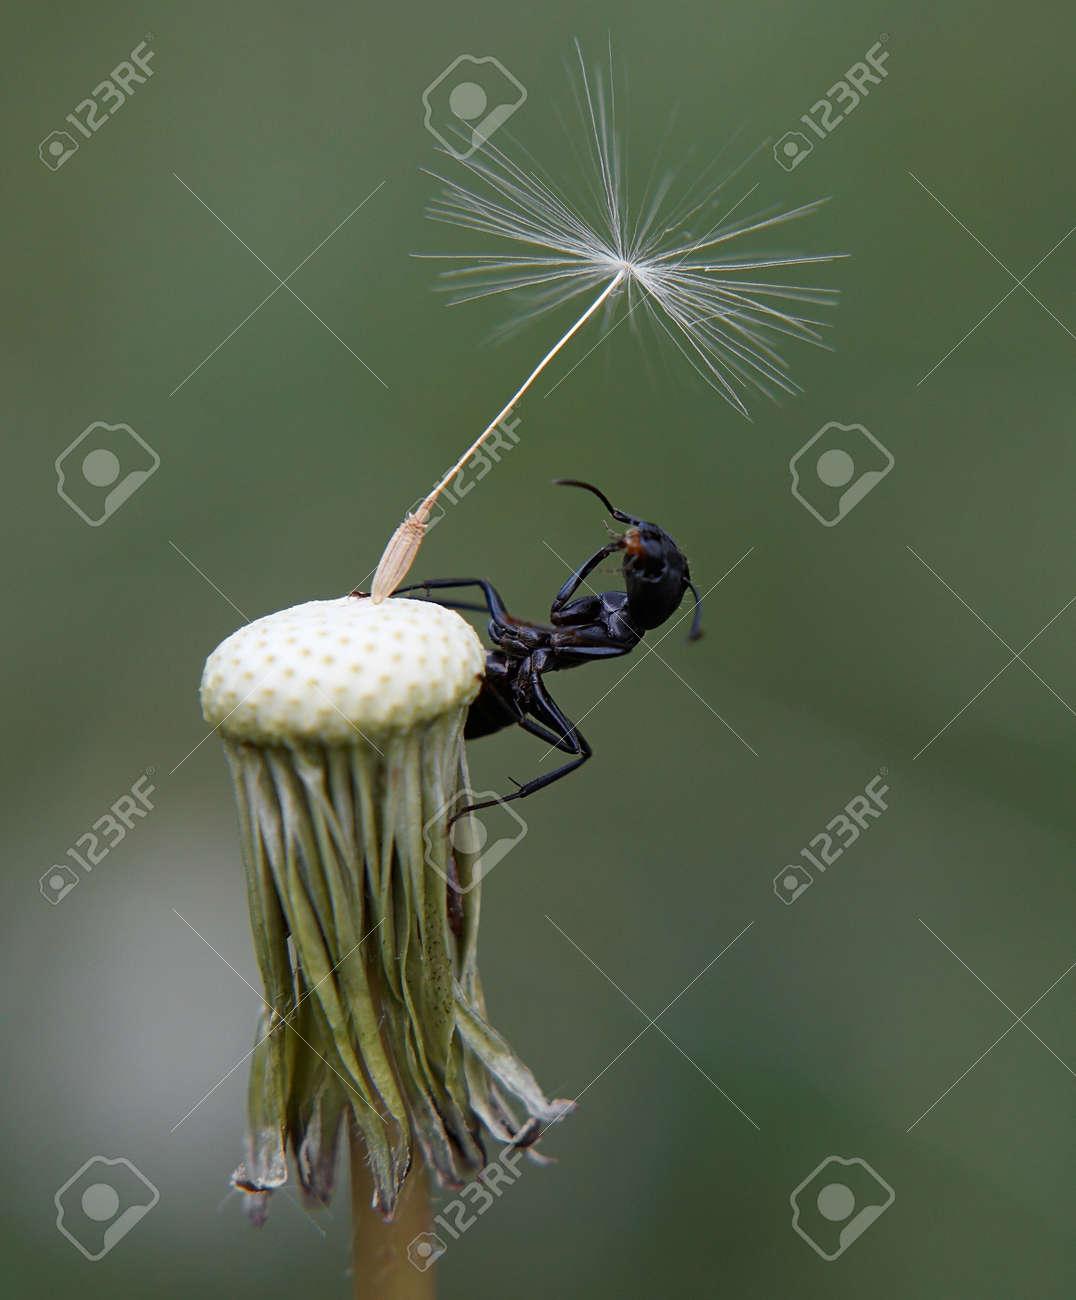 Closeup of Ant on bald dandelion Stock Photo - 6245840